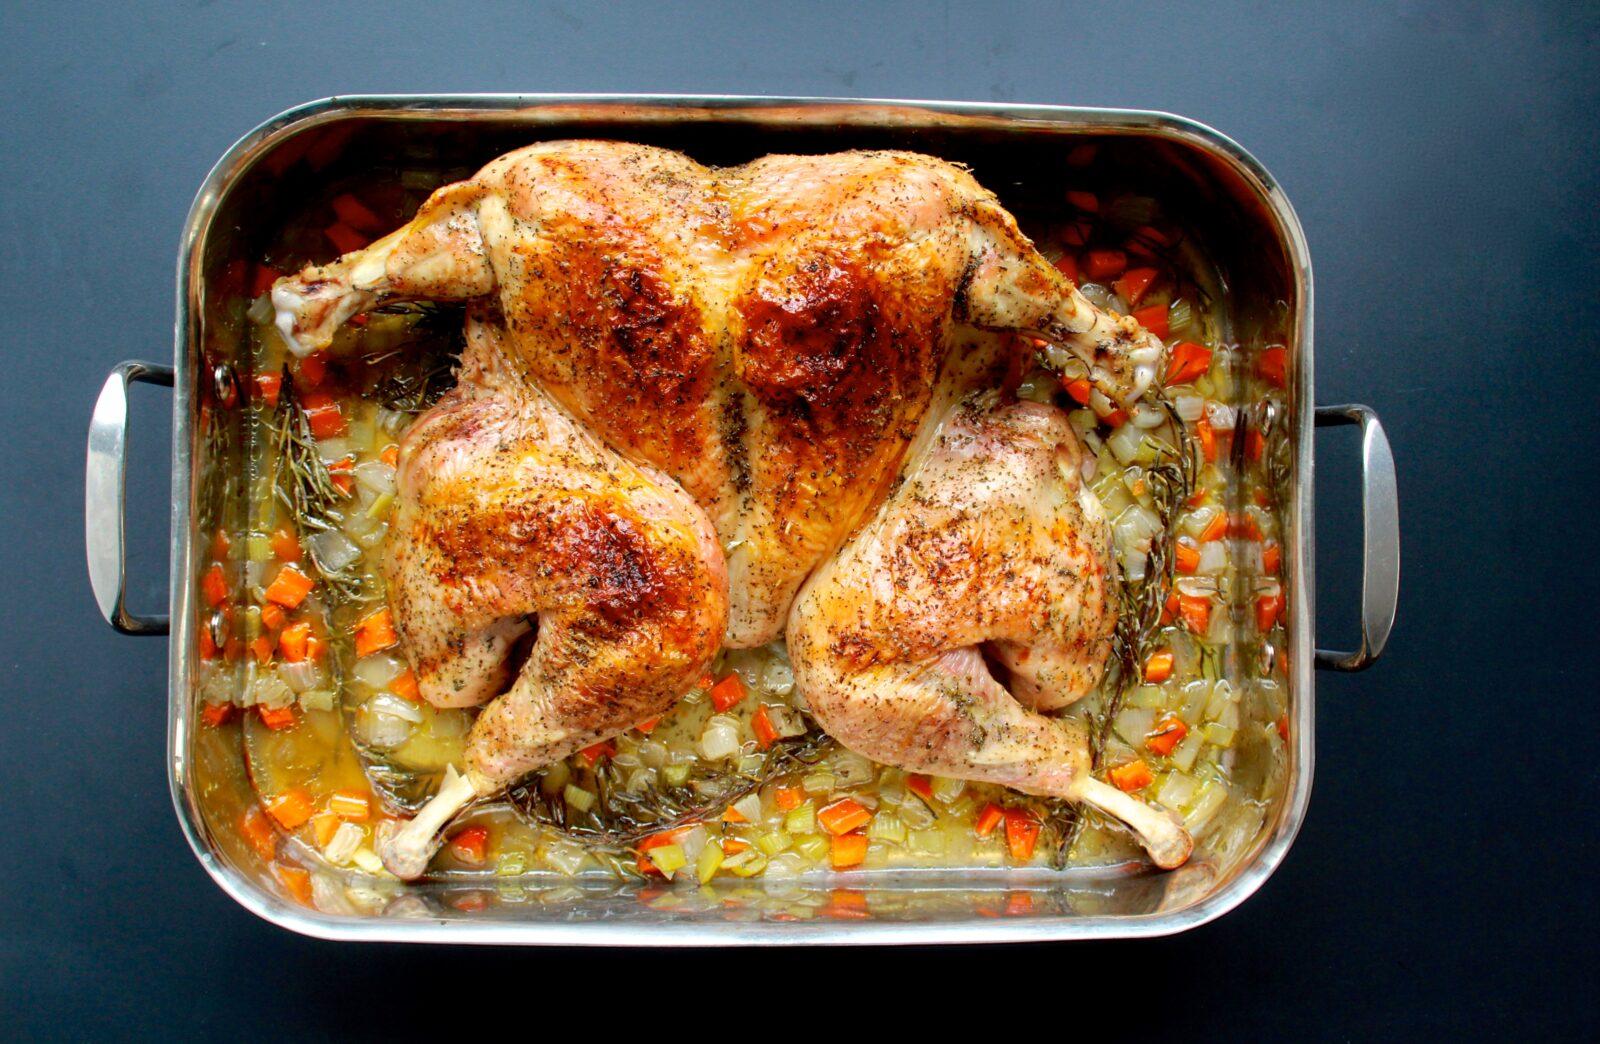 Rosemary Thyme Spatchcock Roast Turkey